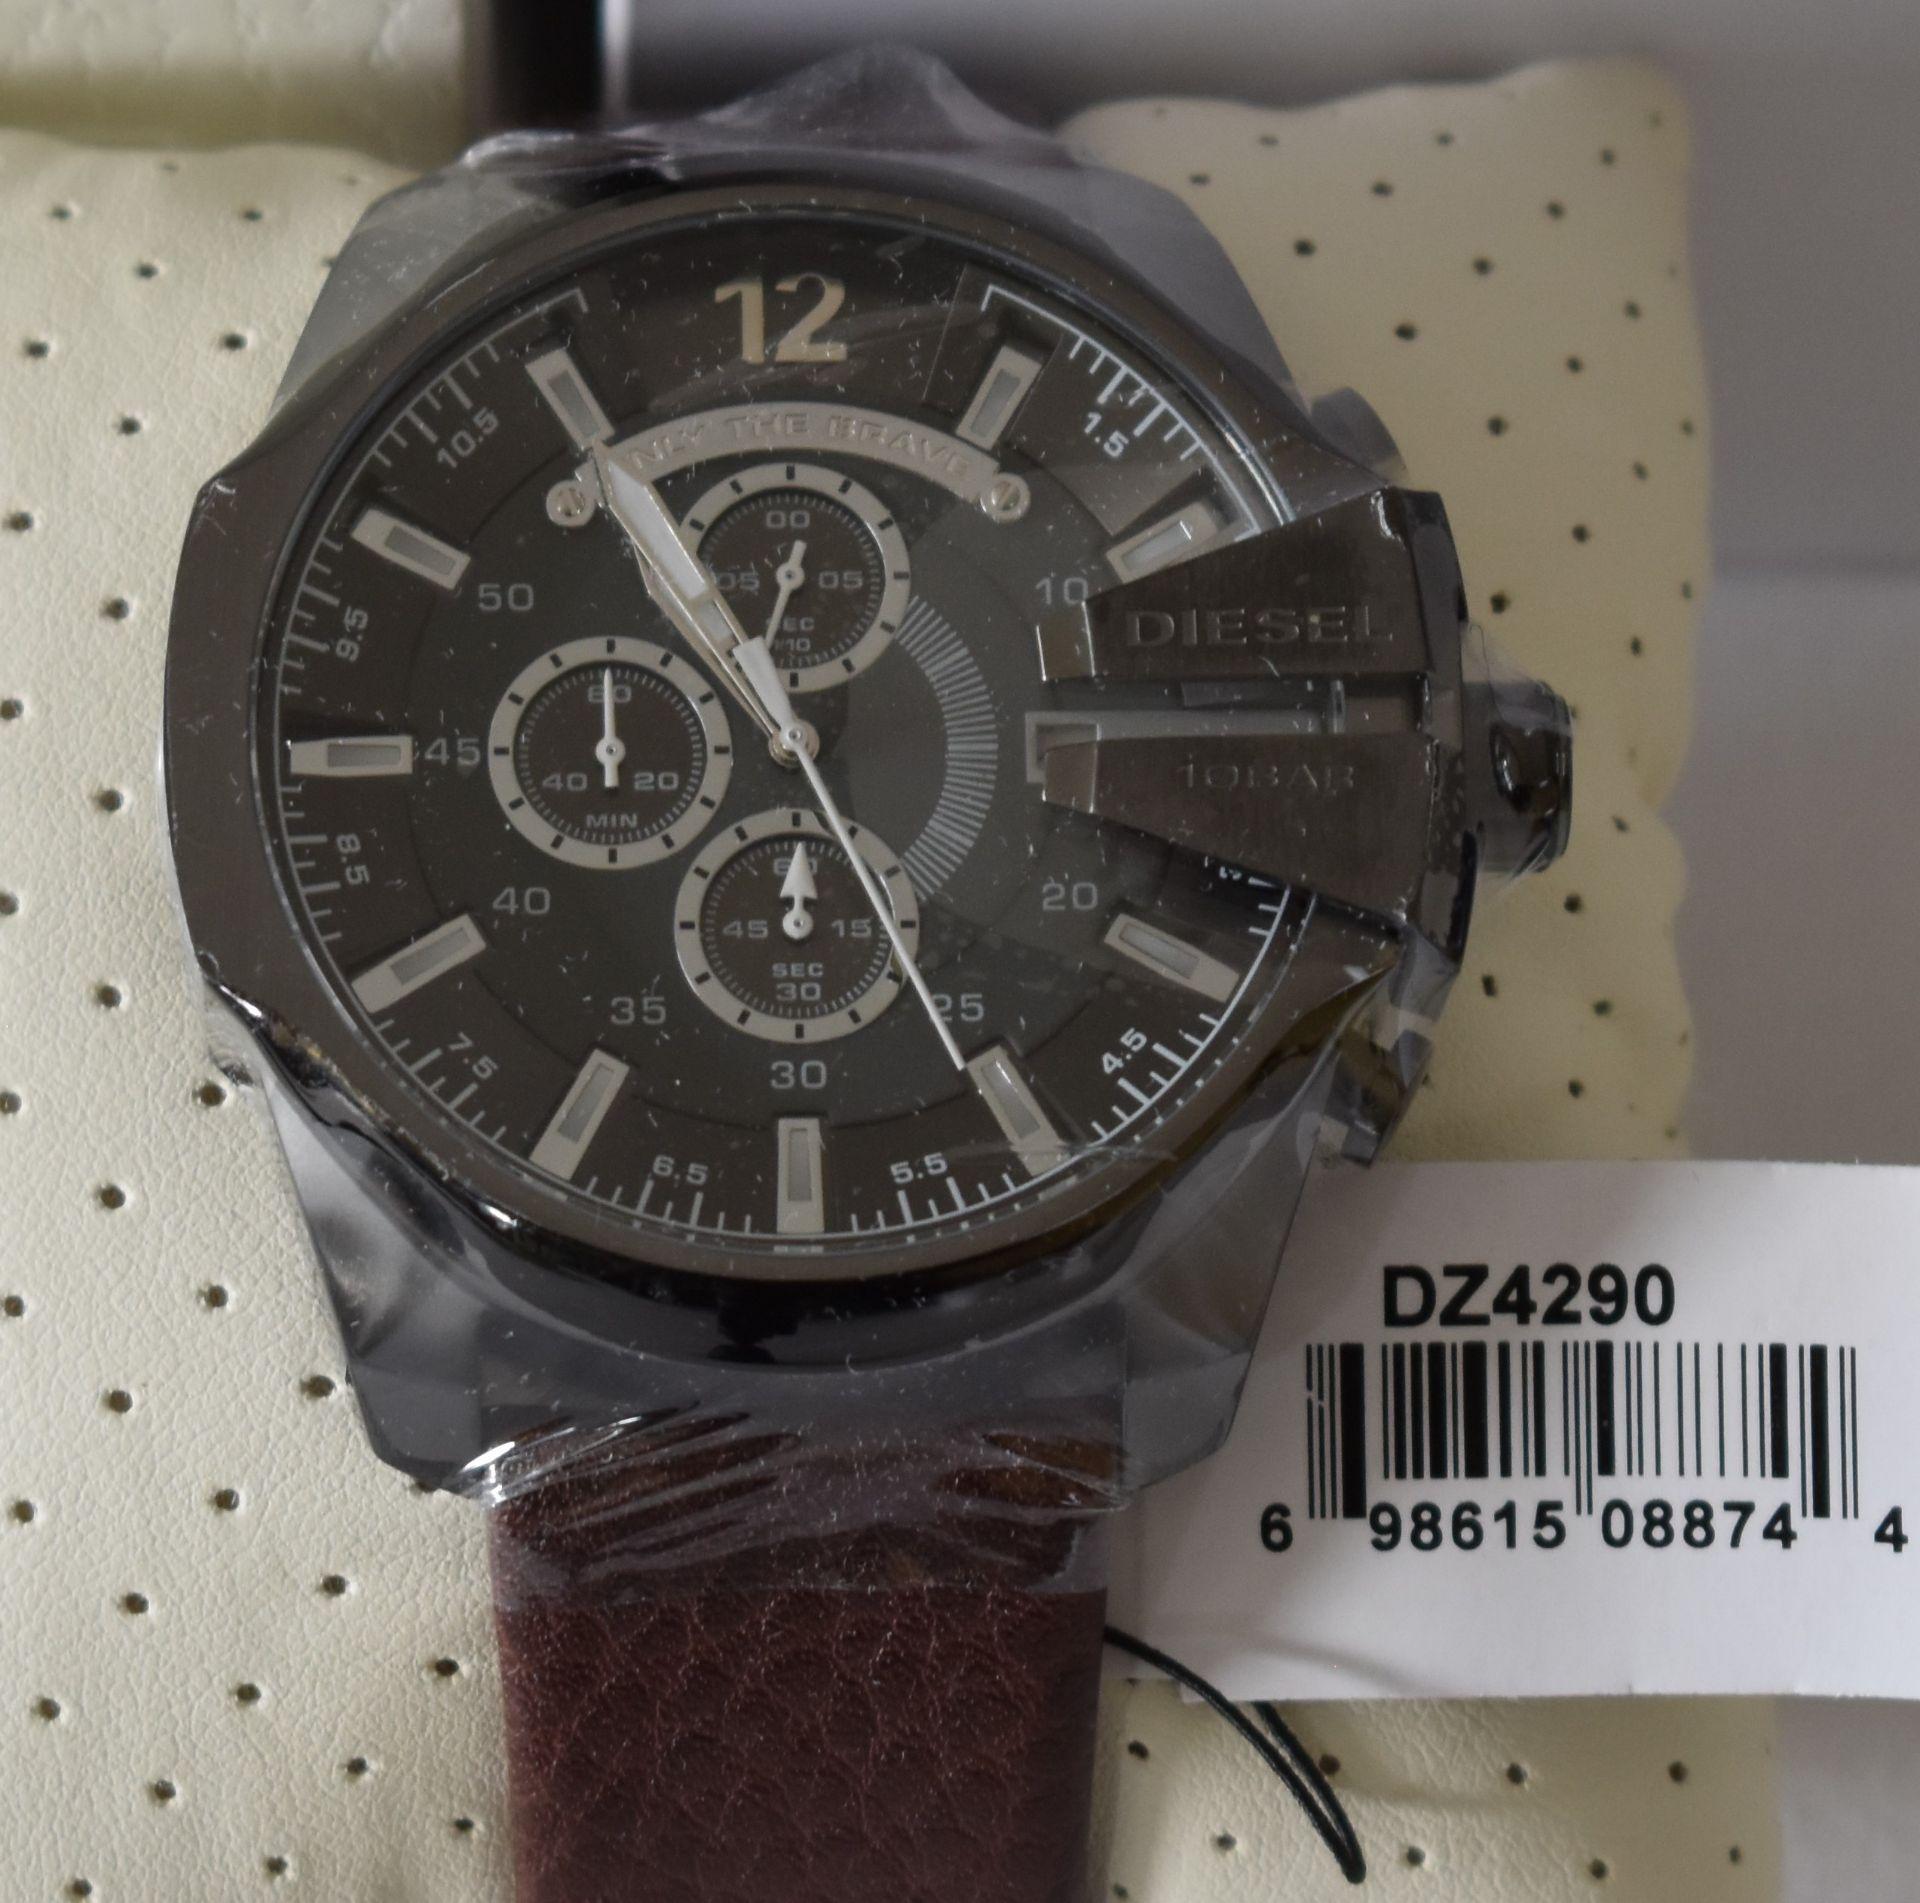 Diesel Men's Watch DZ4290 - Image 2 of 2